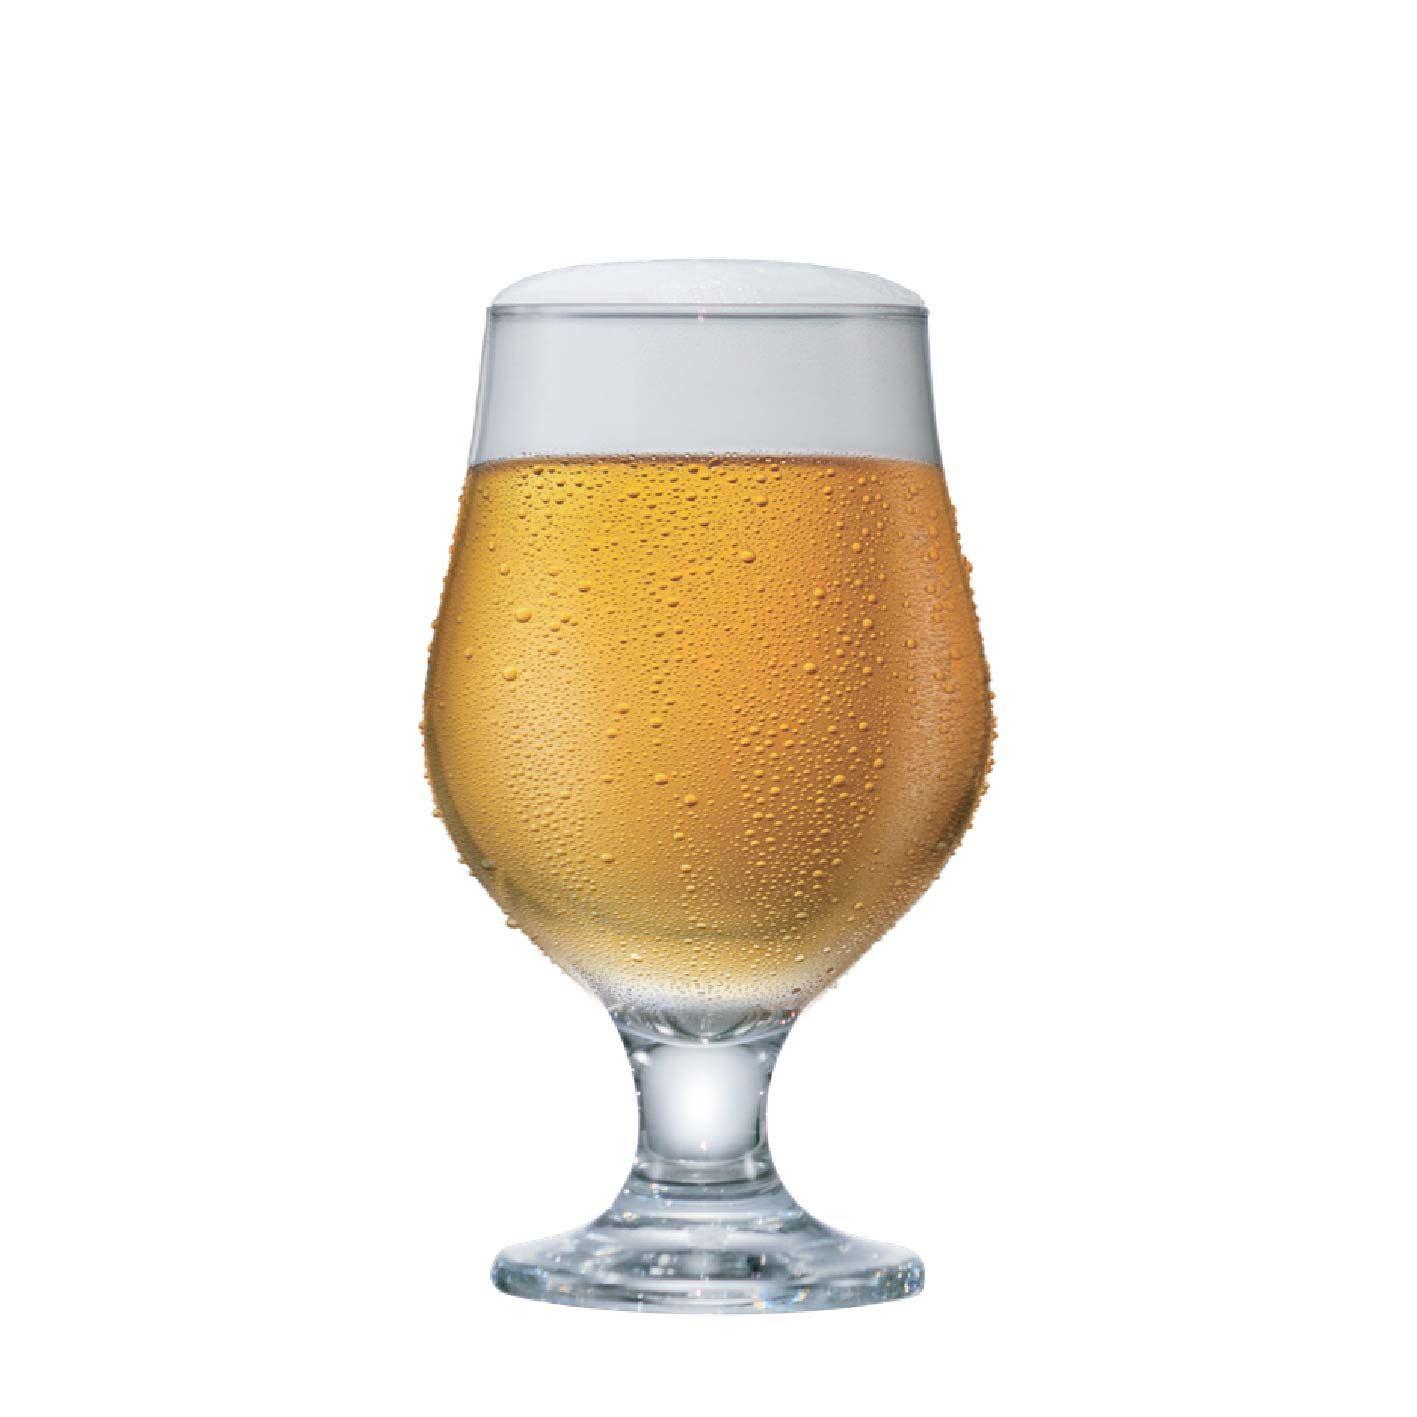 Jogo de Taças para Cerveja Rótulo Beer Master 380ml 2 Pcs